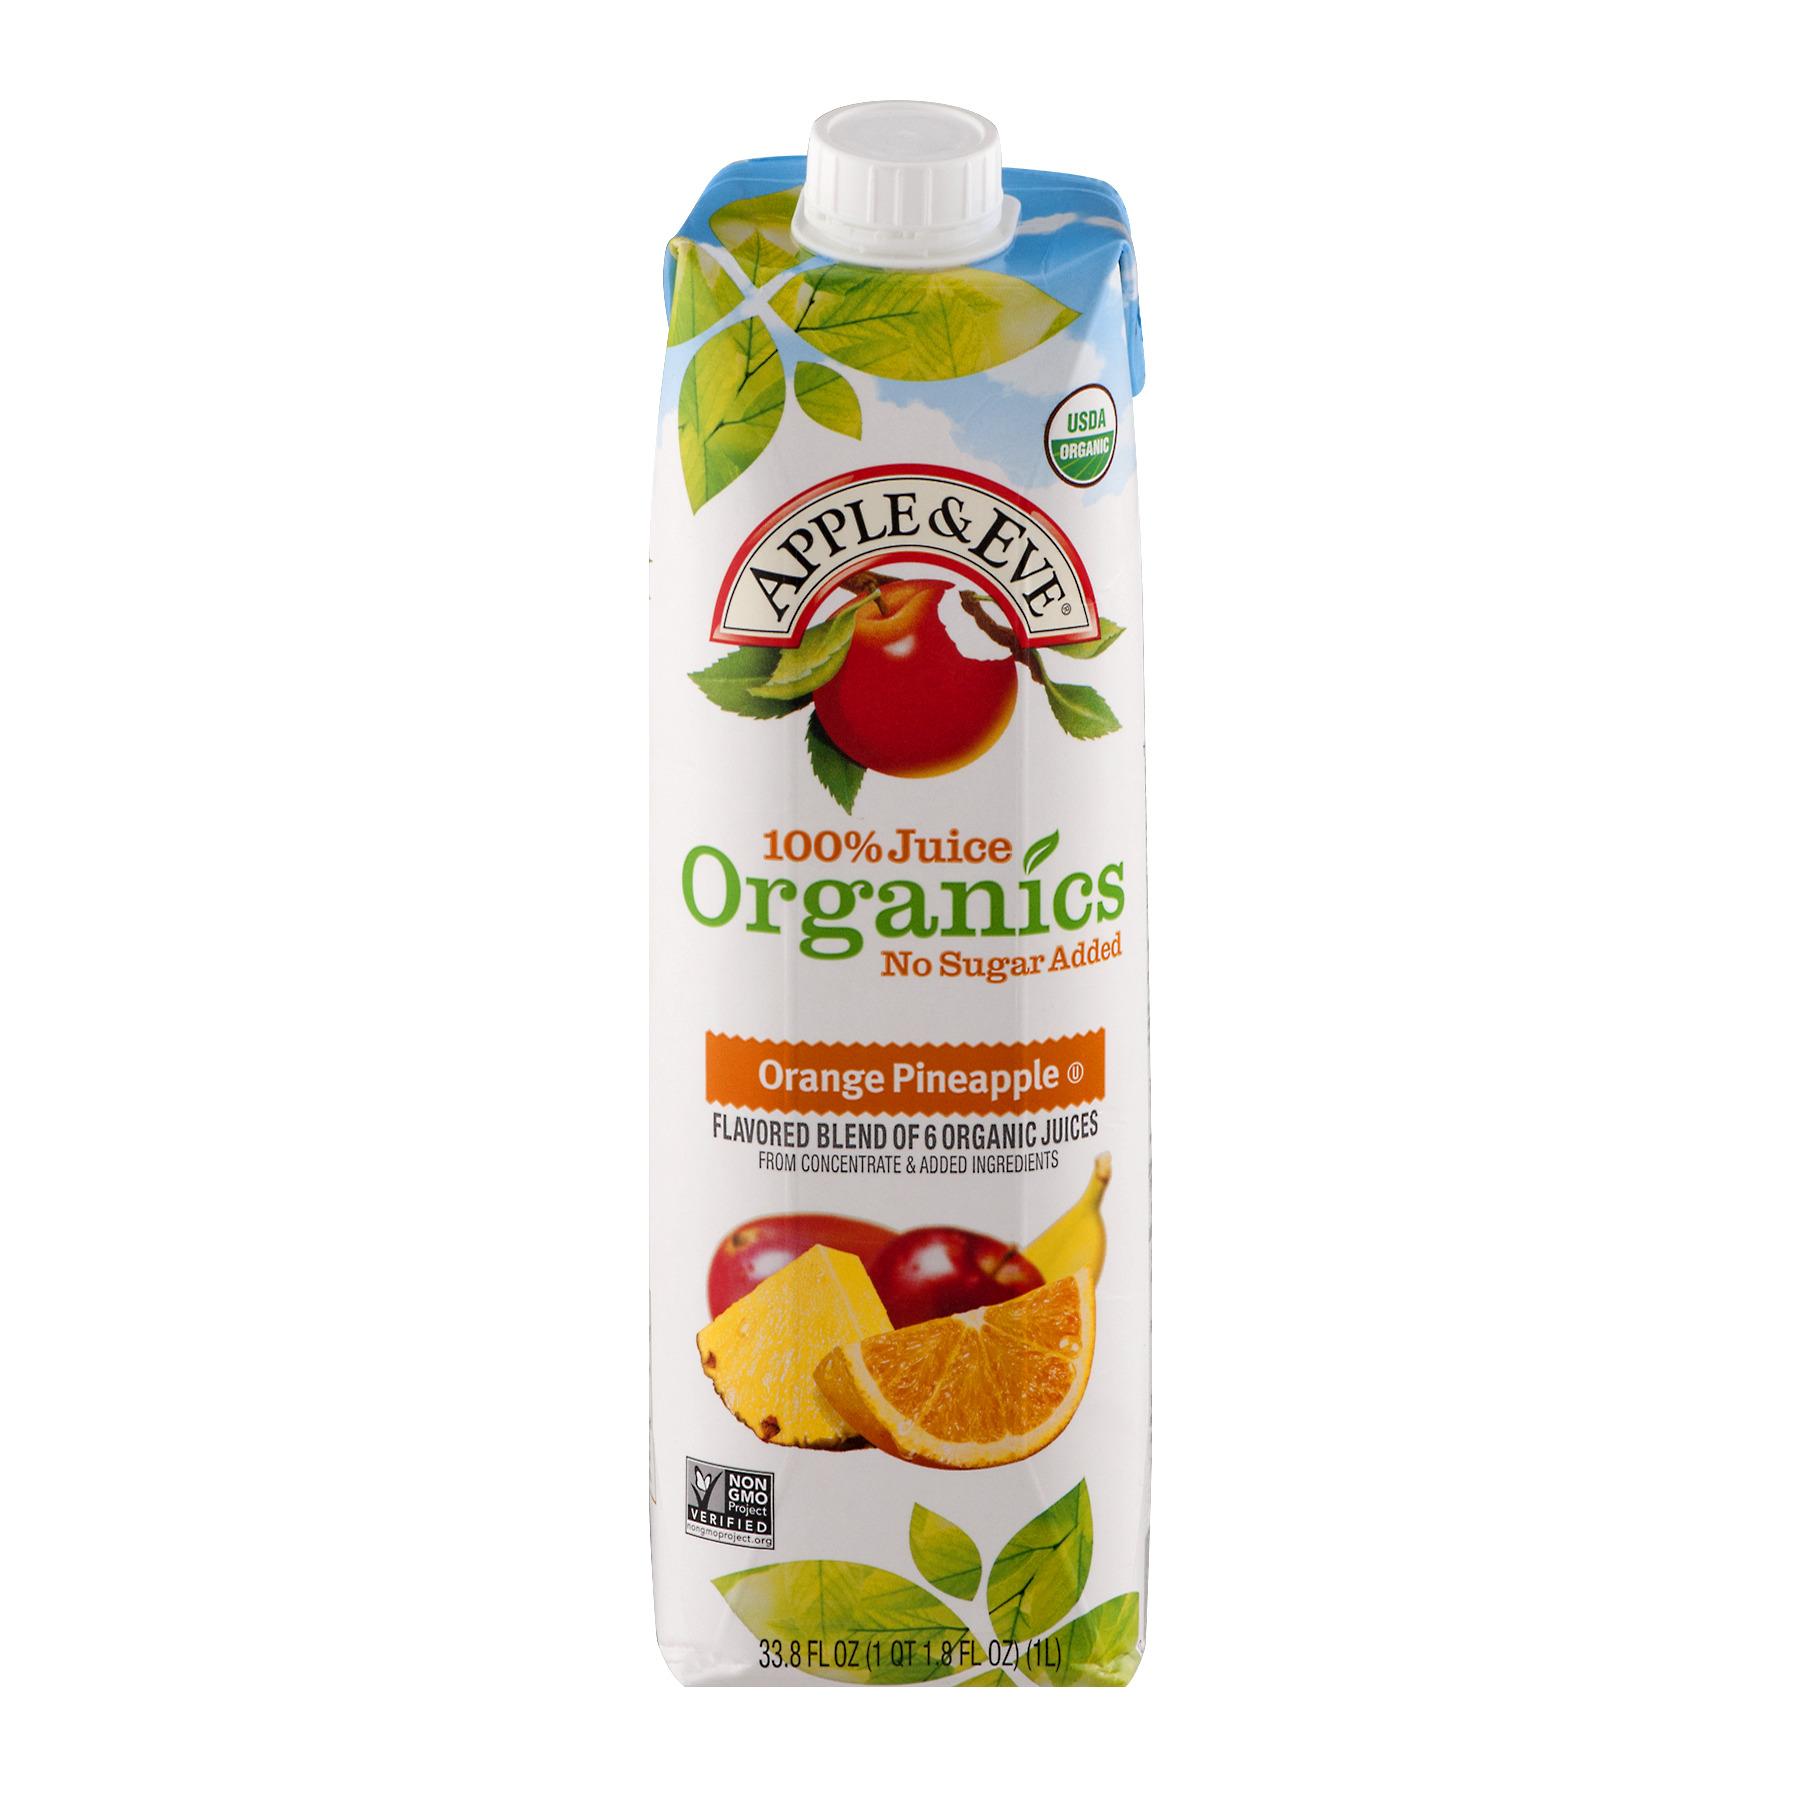 Apple Eve 100 Juice Organics Orange Pineapple Juice 33